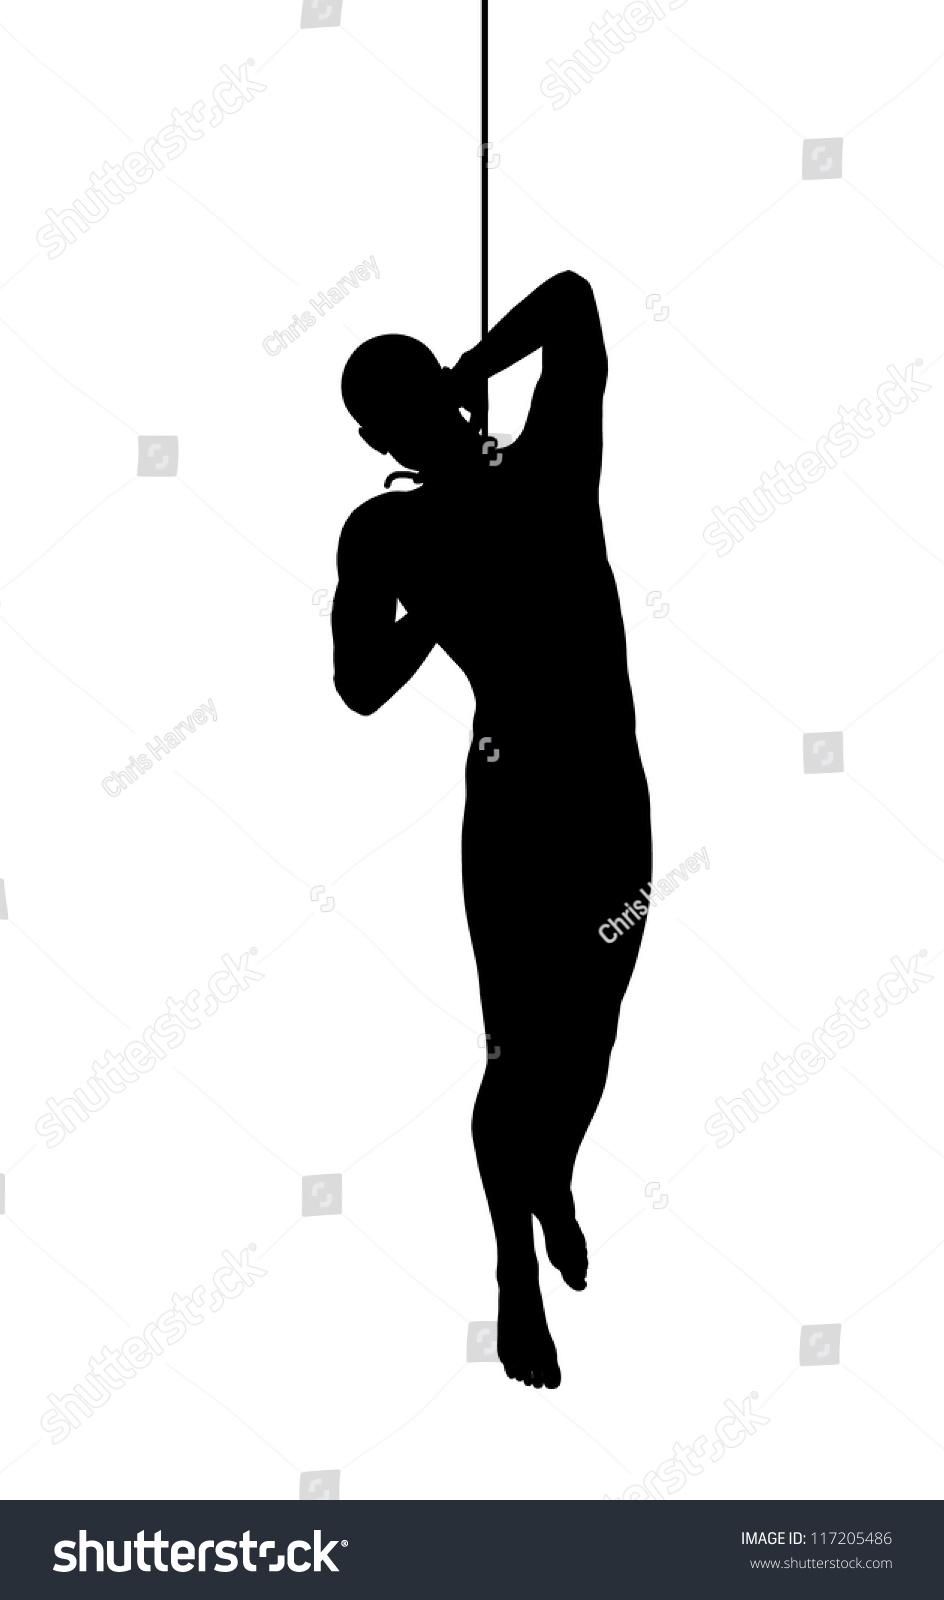 silhouette hanging man stock illustration 117205486 shutterstock